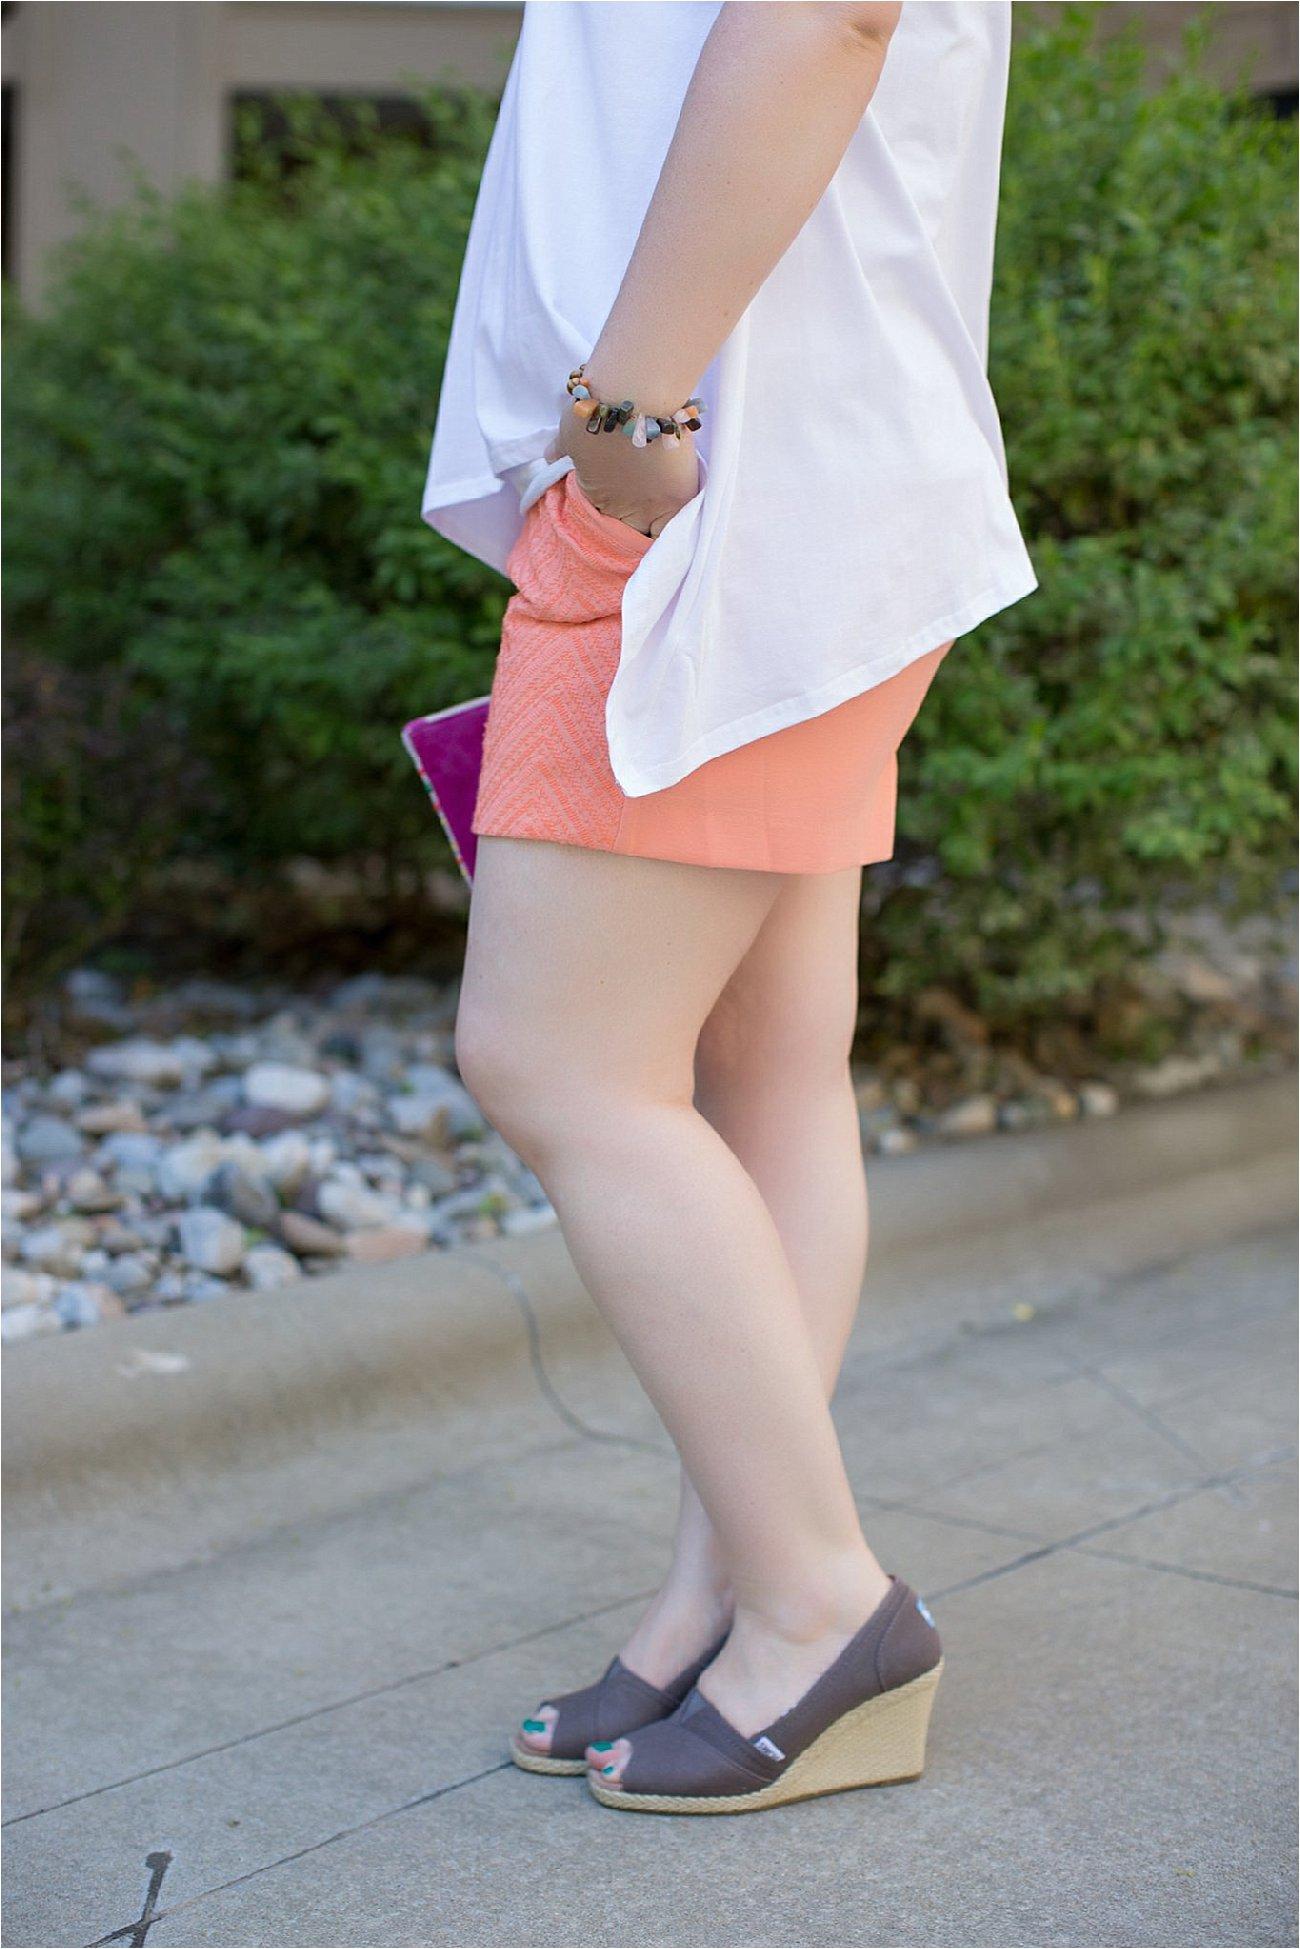 Elegantees #letitshinecollection Bridgid tee, Stitch Fix textured shorts, TOMS wedges - ethical spring fashion - ethical spring style - ethical fashion blogger (4)